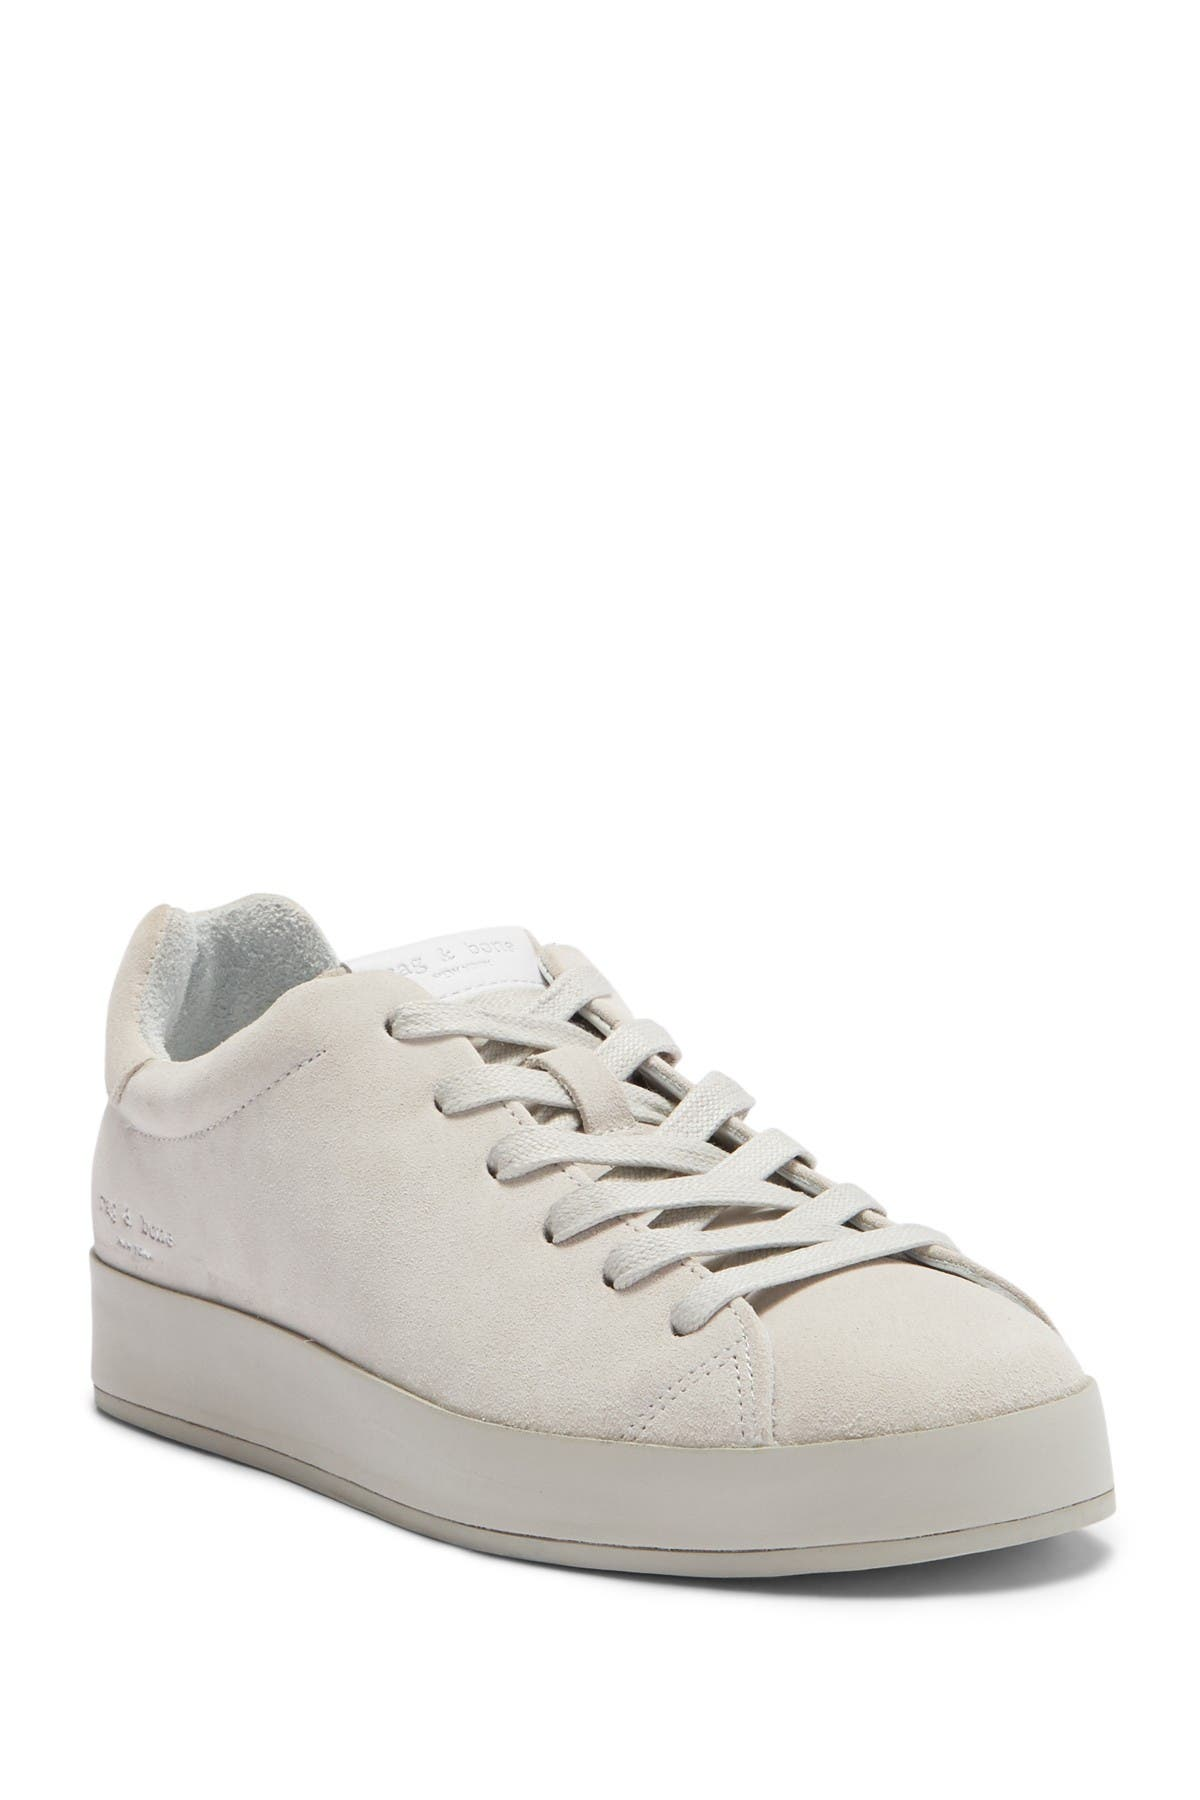 Rag \u0026 Bone | RB1 Low Top Leather